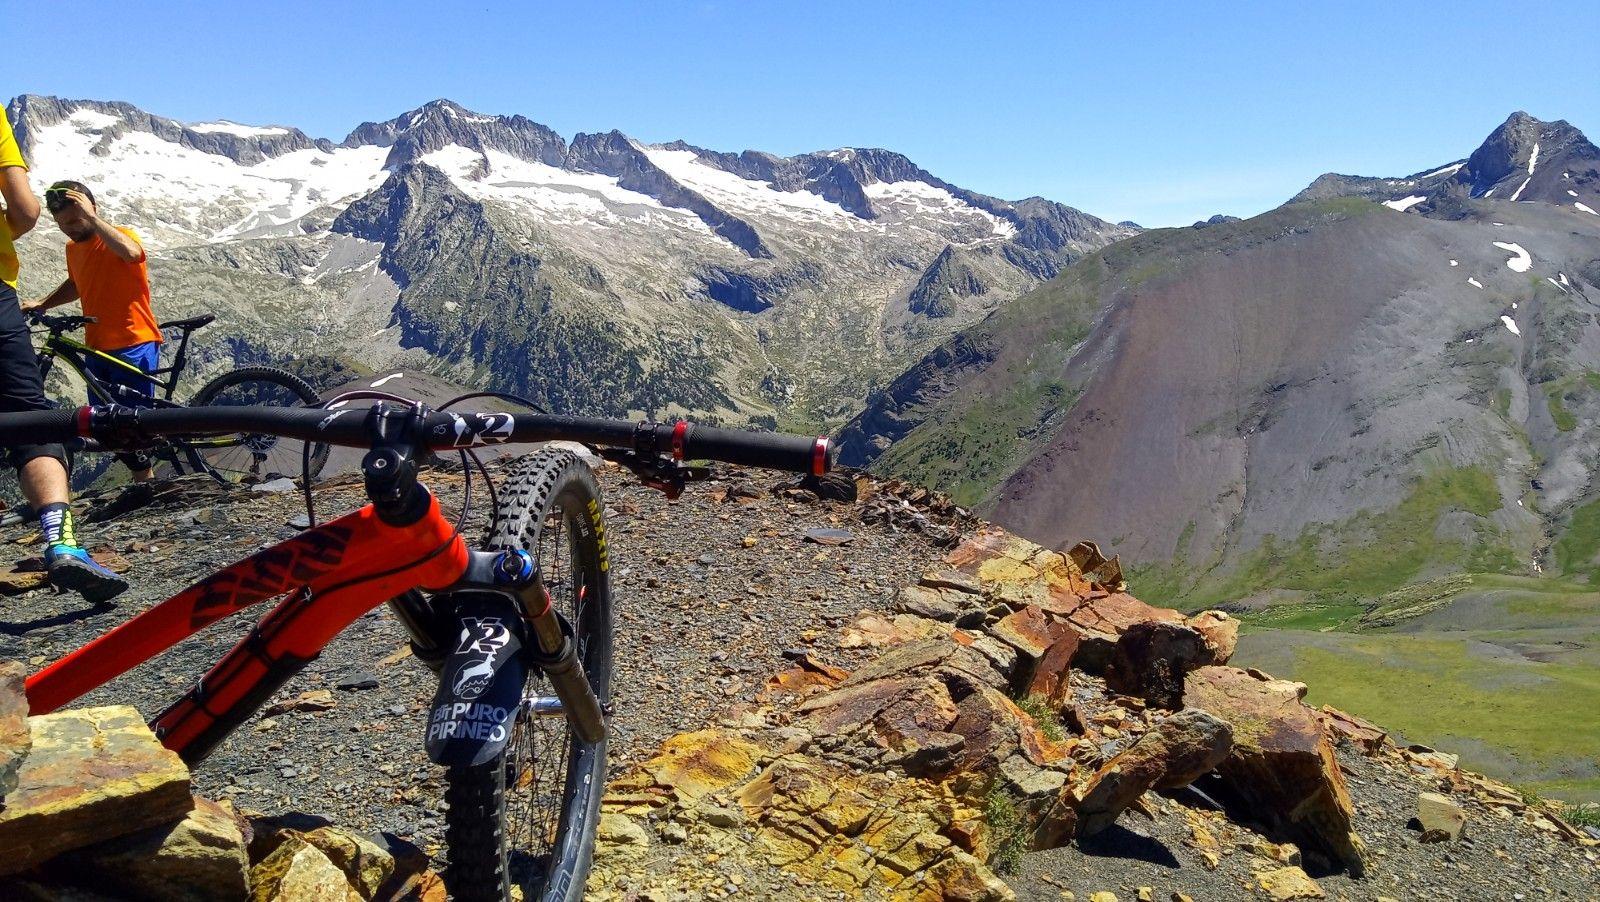 IMG 20200704 121708 - Estibafreda pedaleando con vistas.